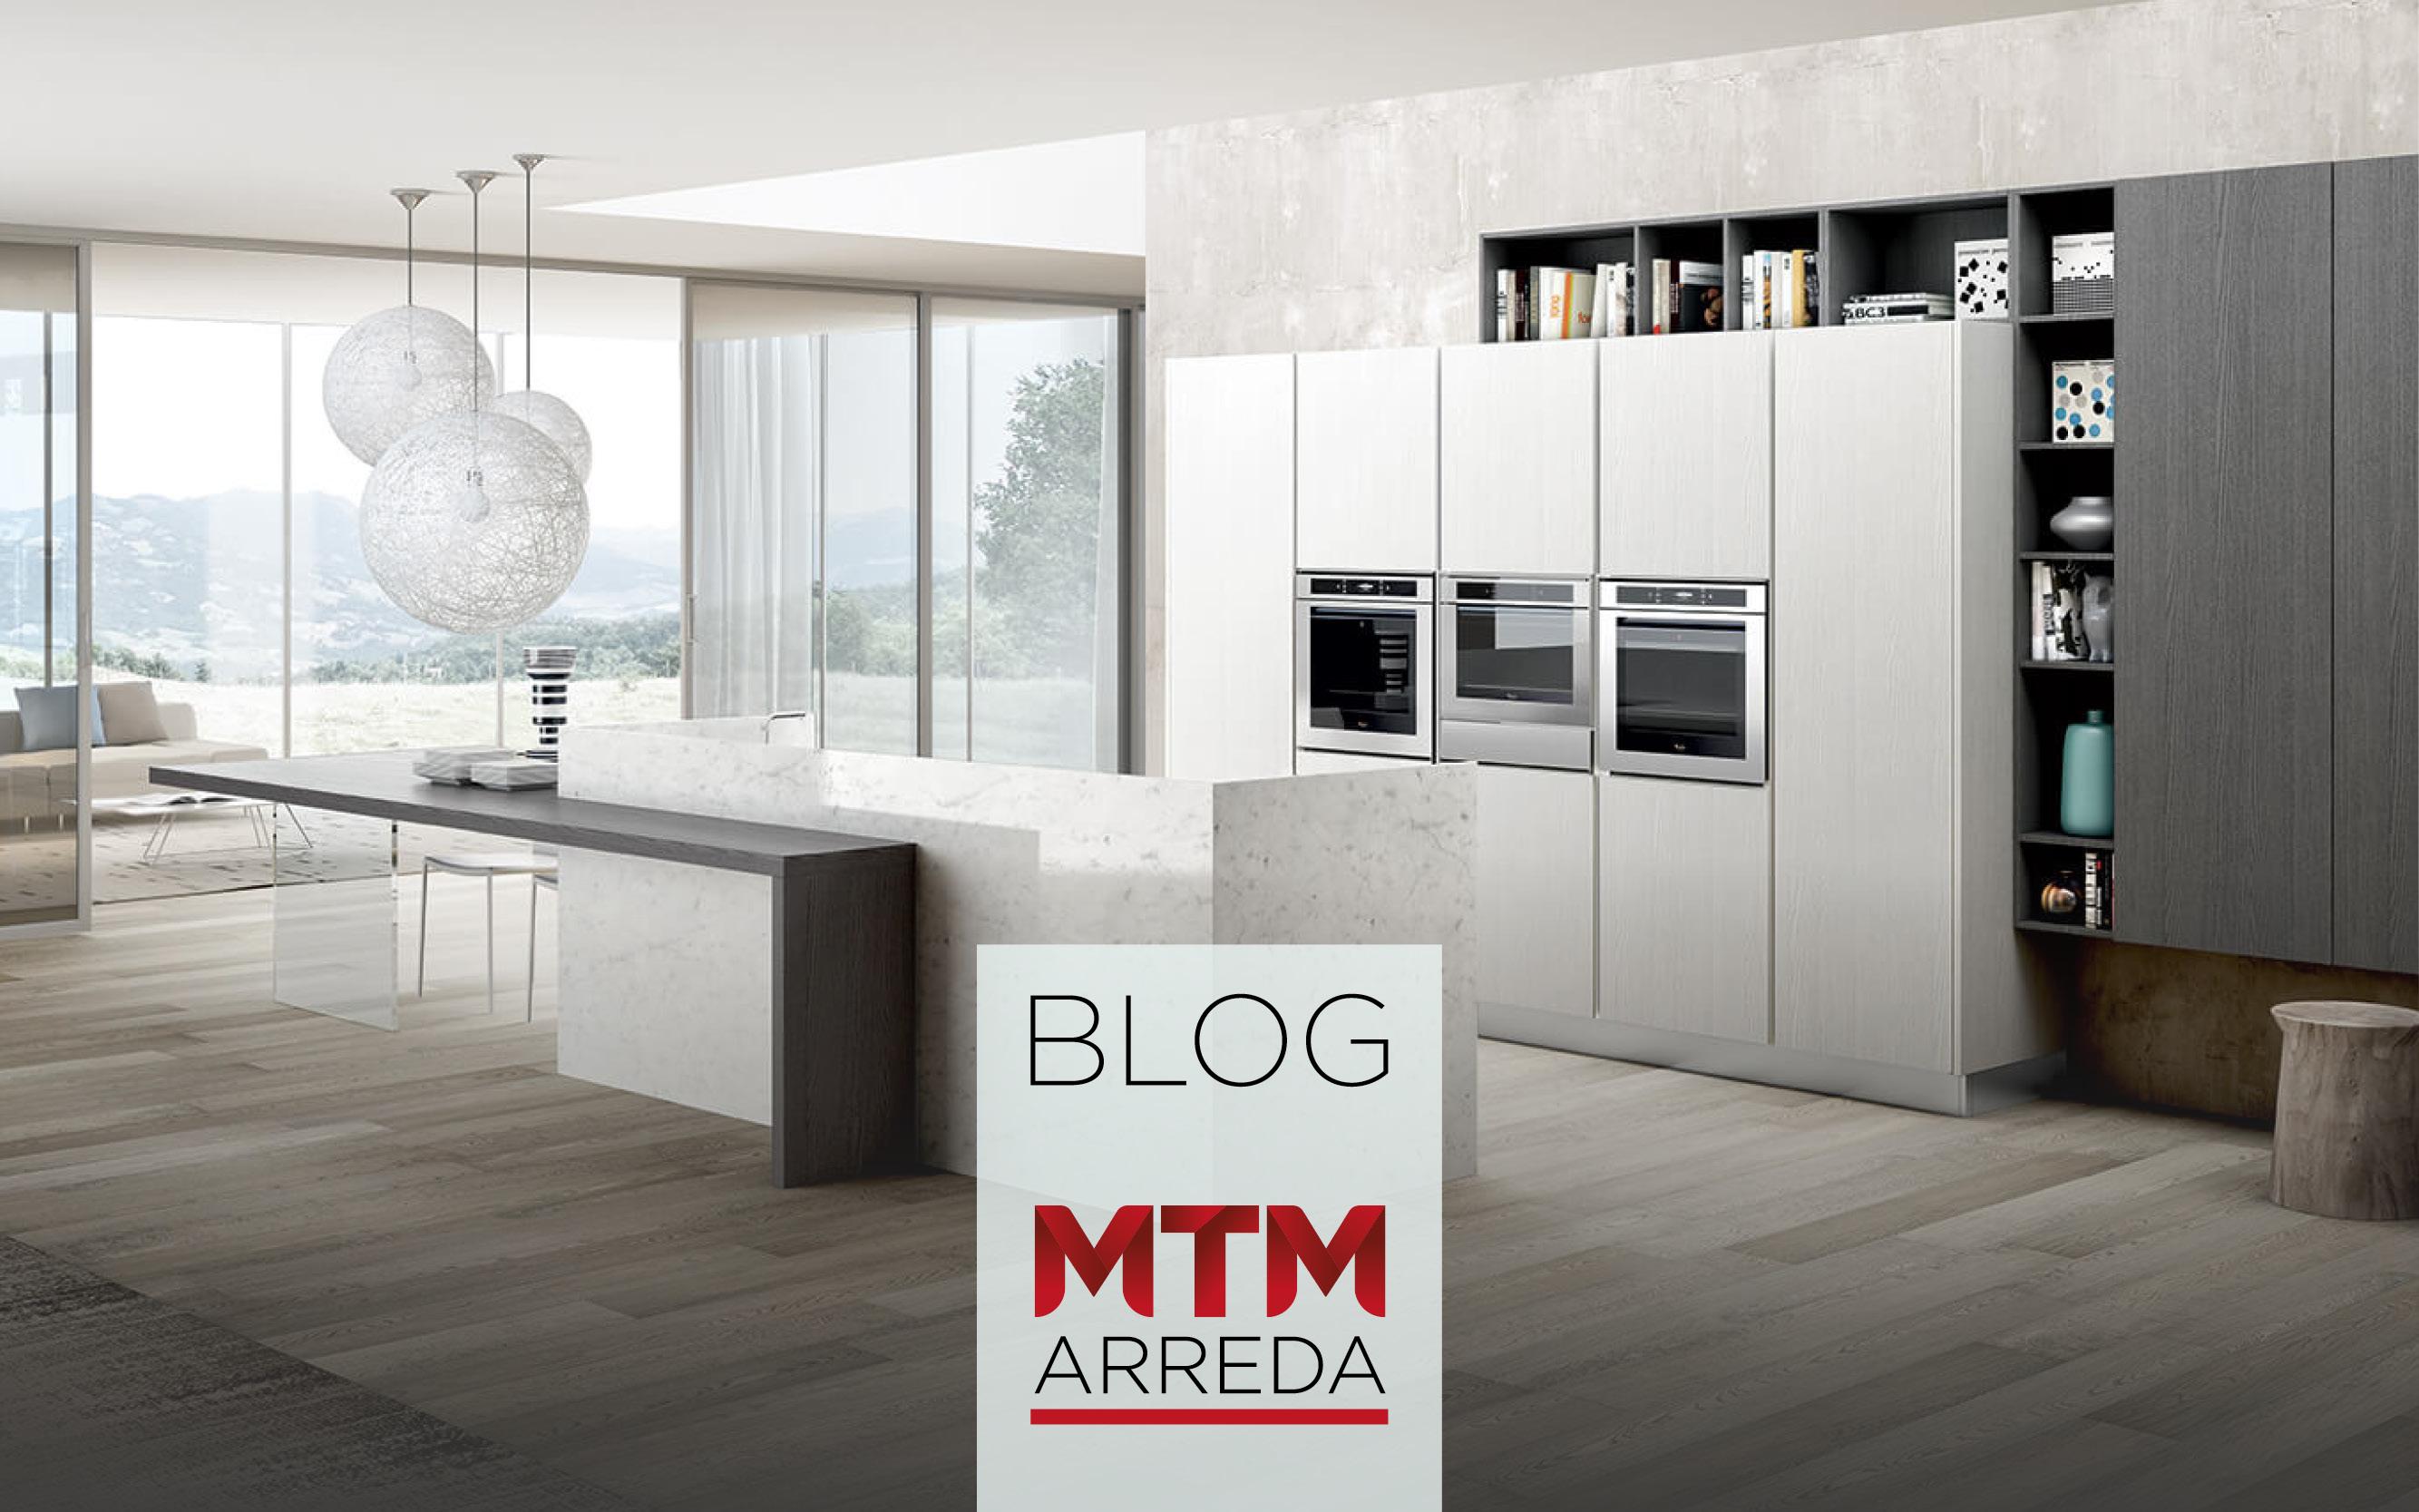 MTM-arreda-Blog-cucina-moderna-2020